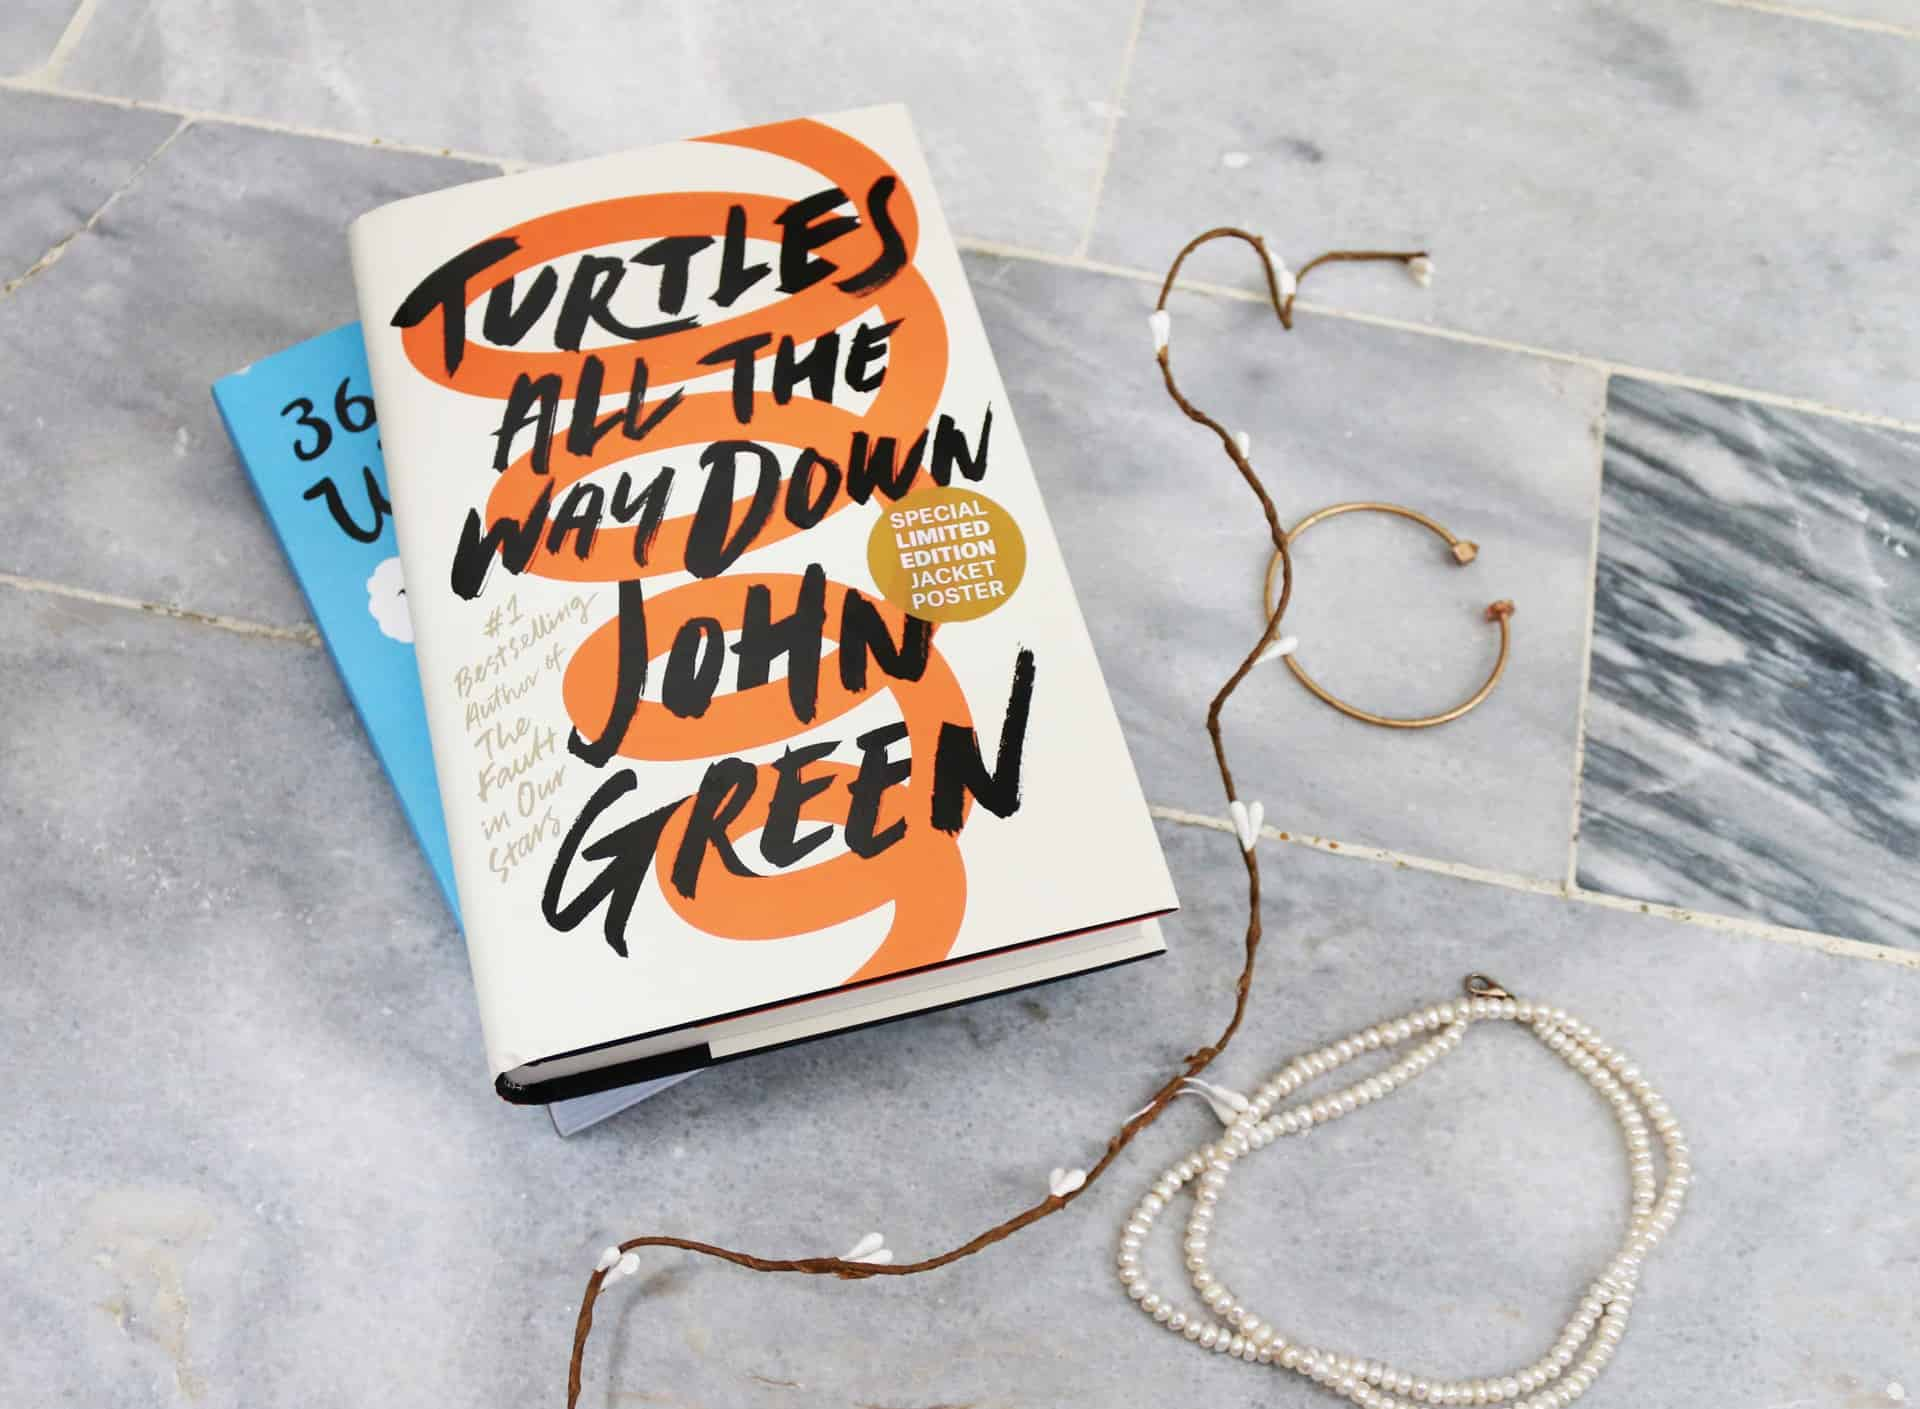 Turtles All The Way Down John Green